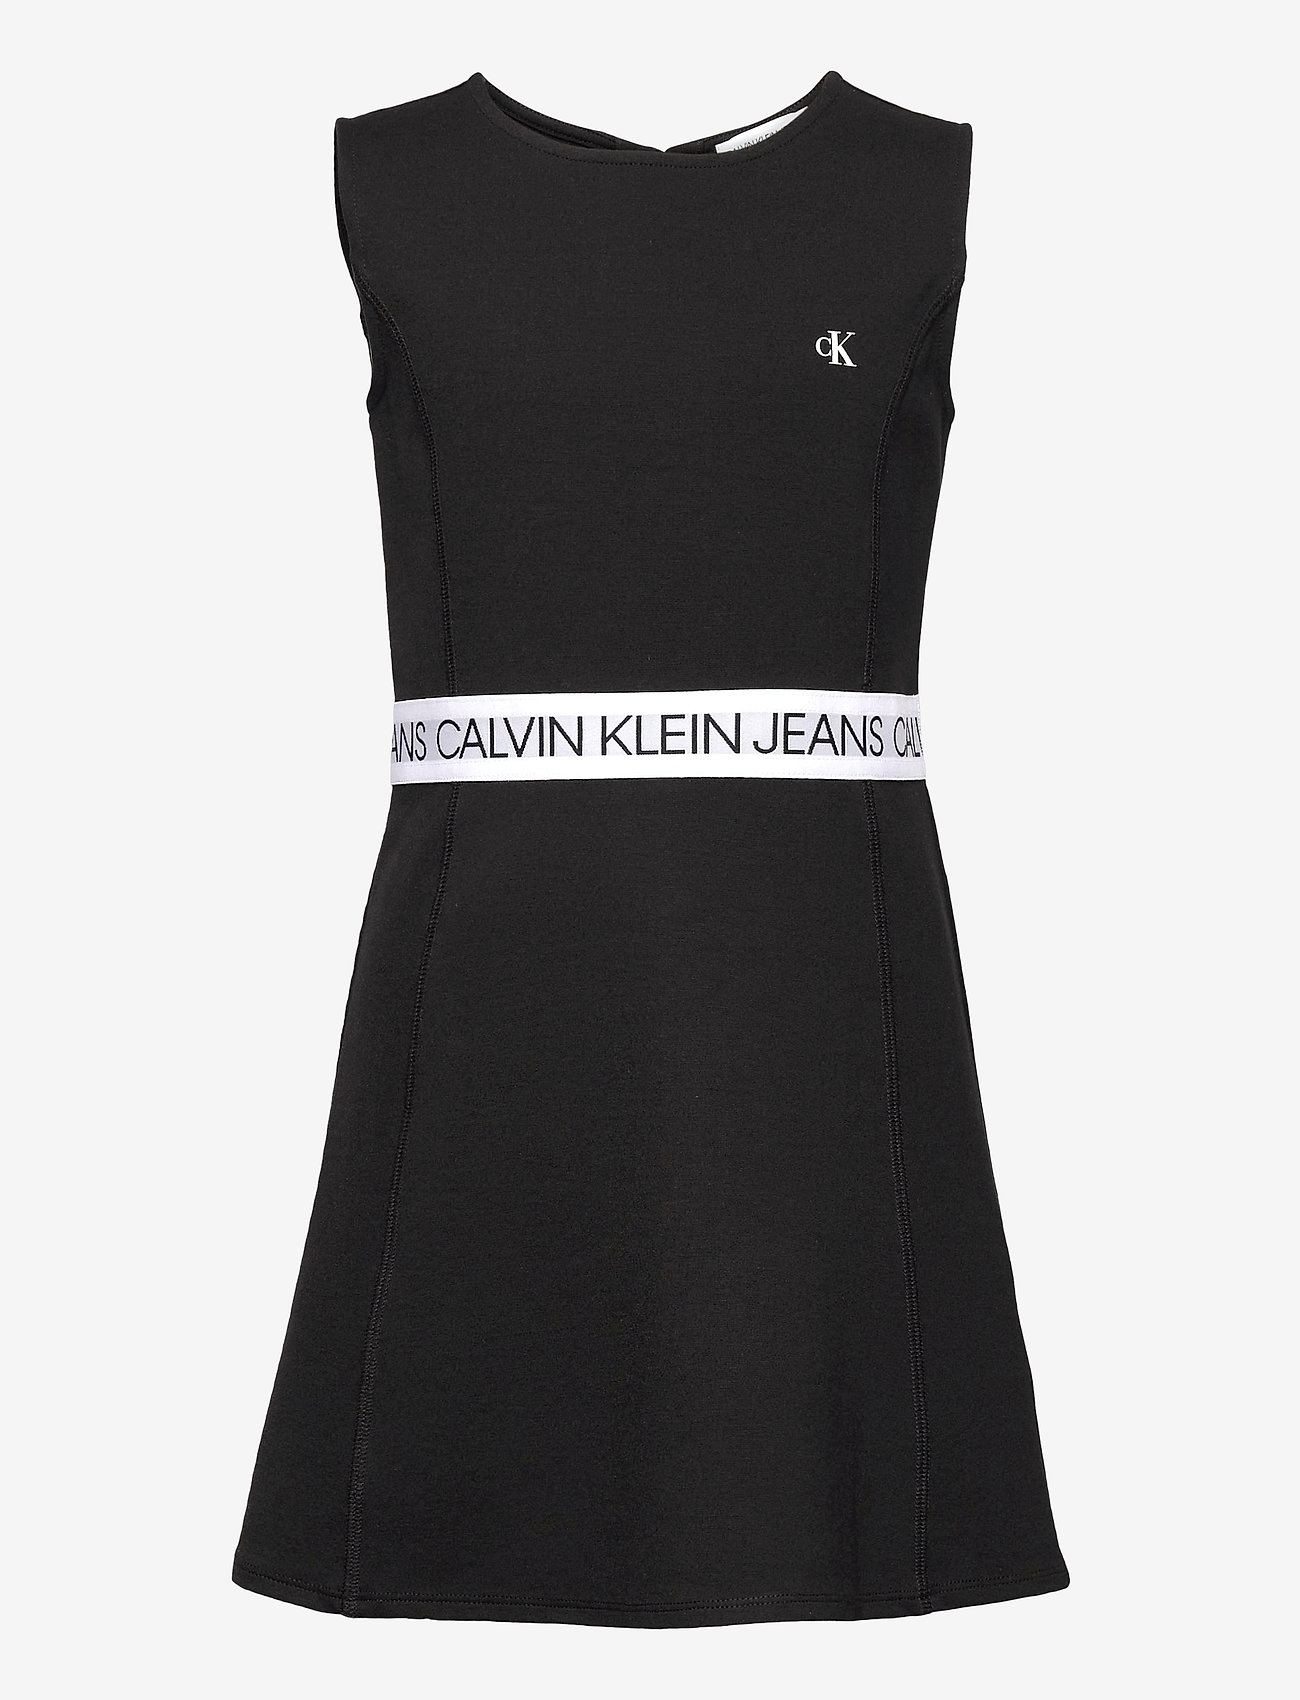 Calvin Klein - LOGO TAPE PUNTO SLEEVELESS DRESS - kleider - ck black - 0